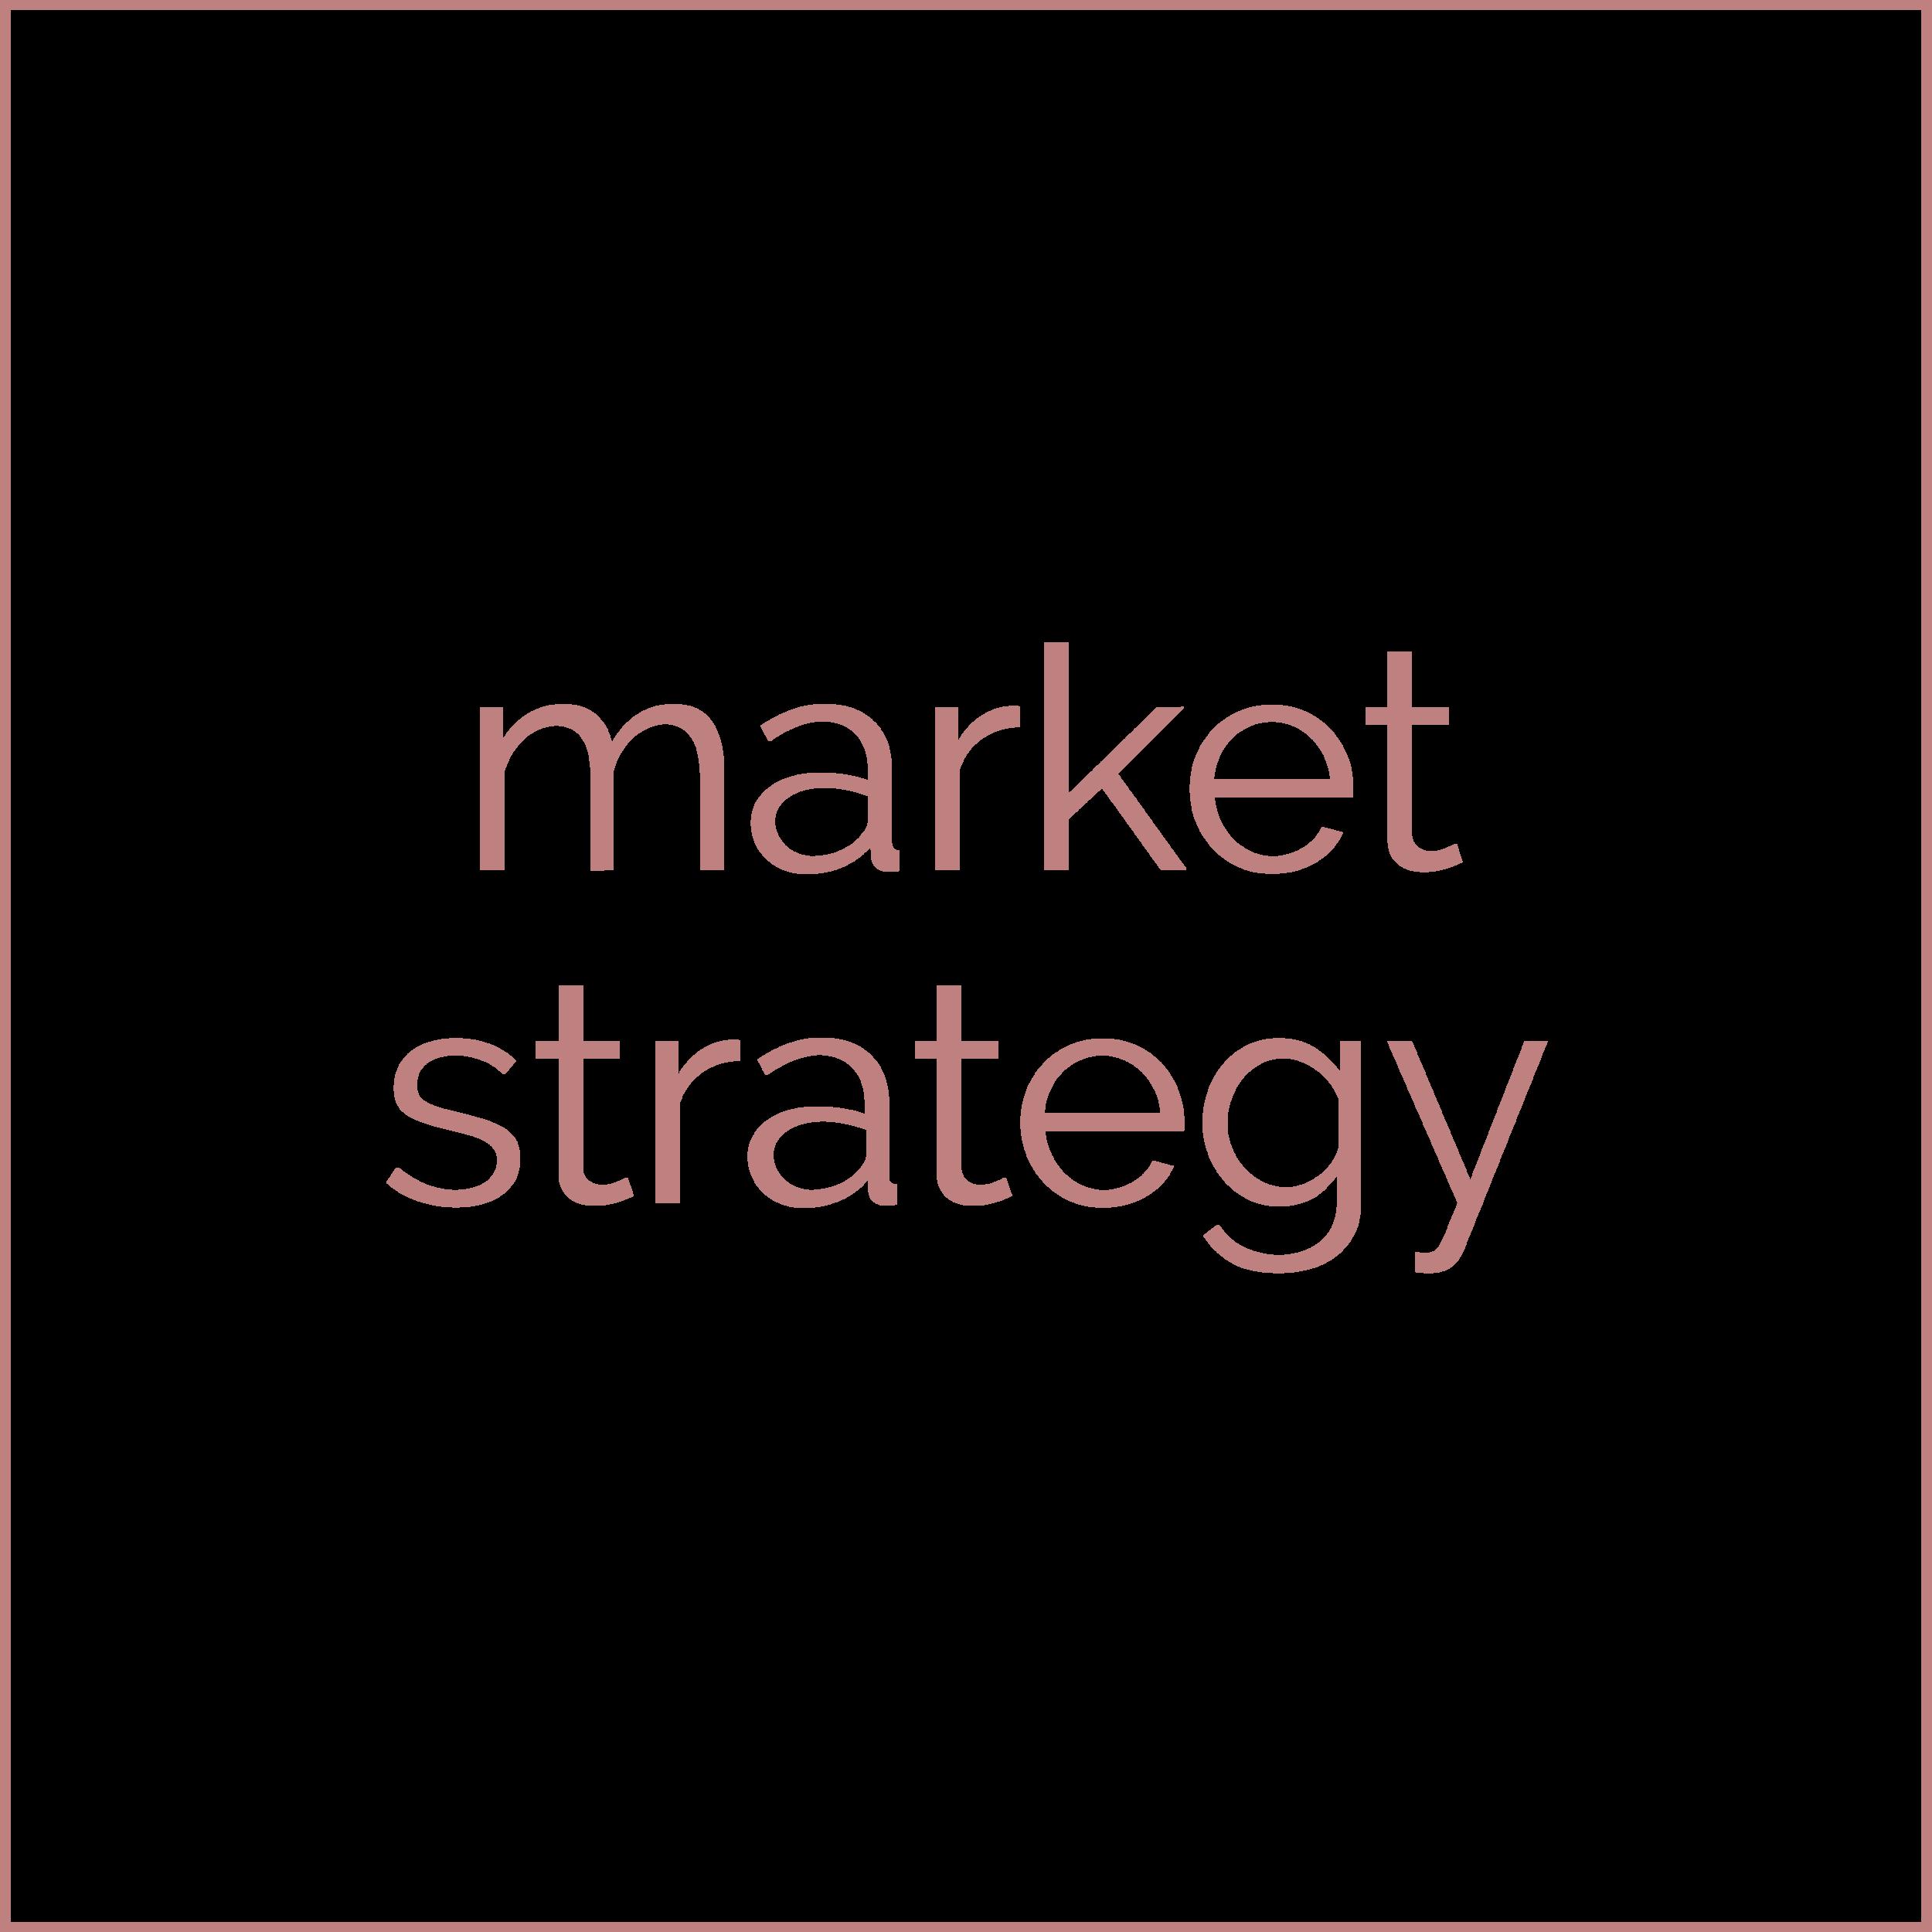 MarketStrategy.jpg